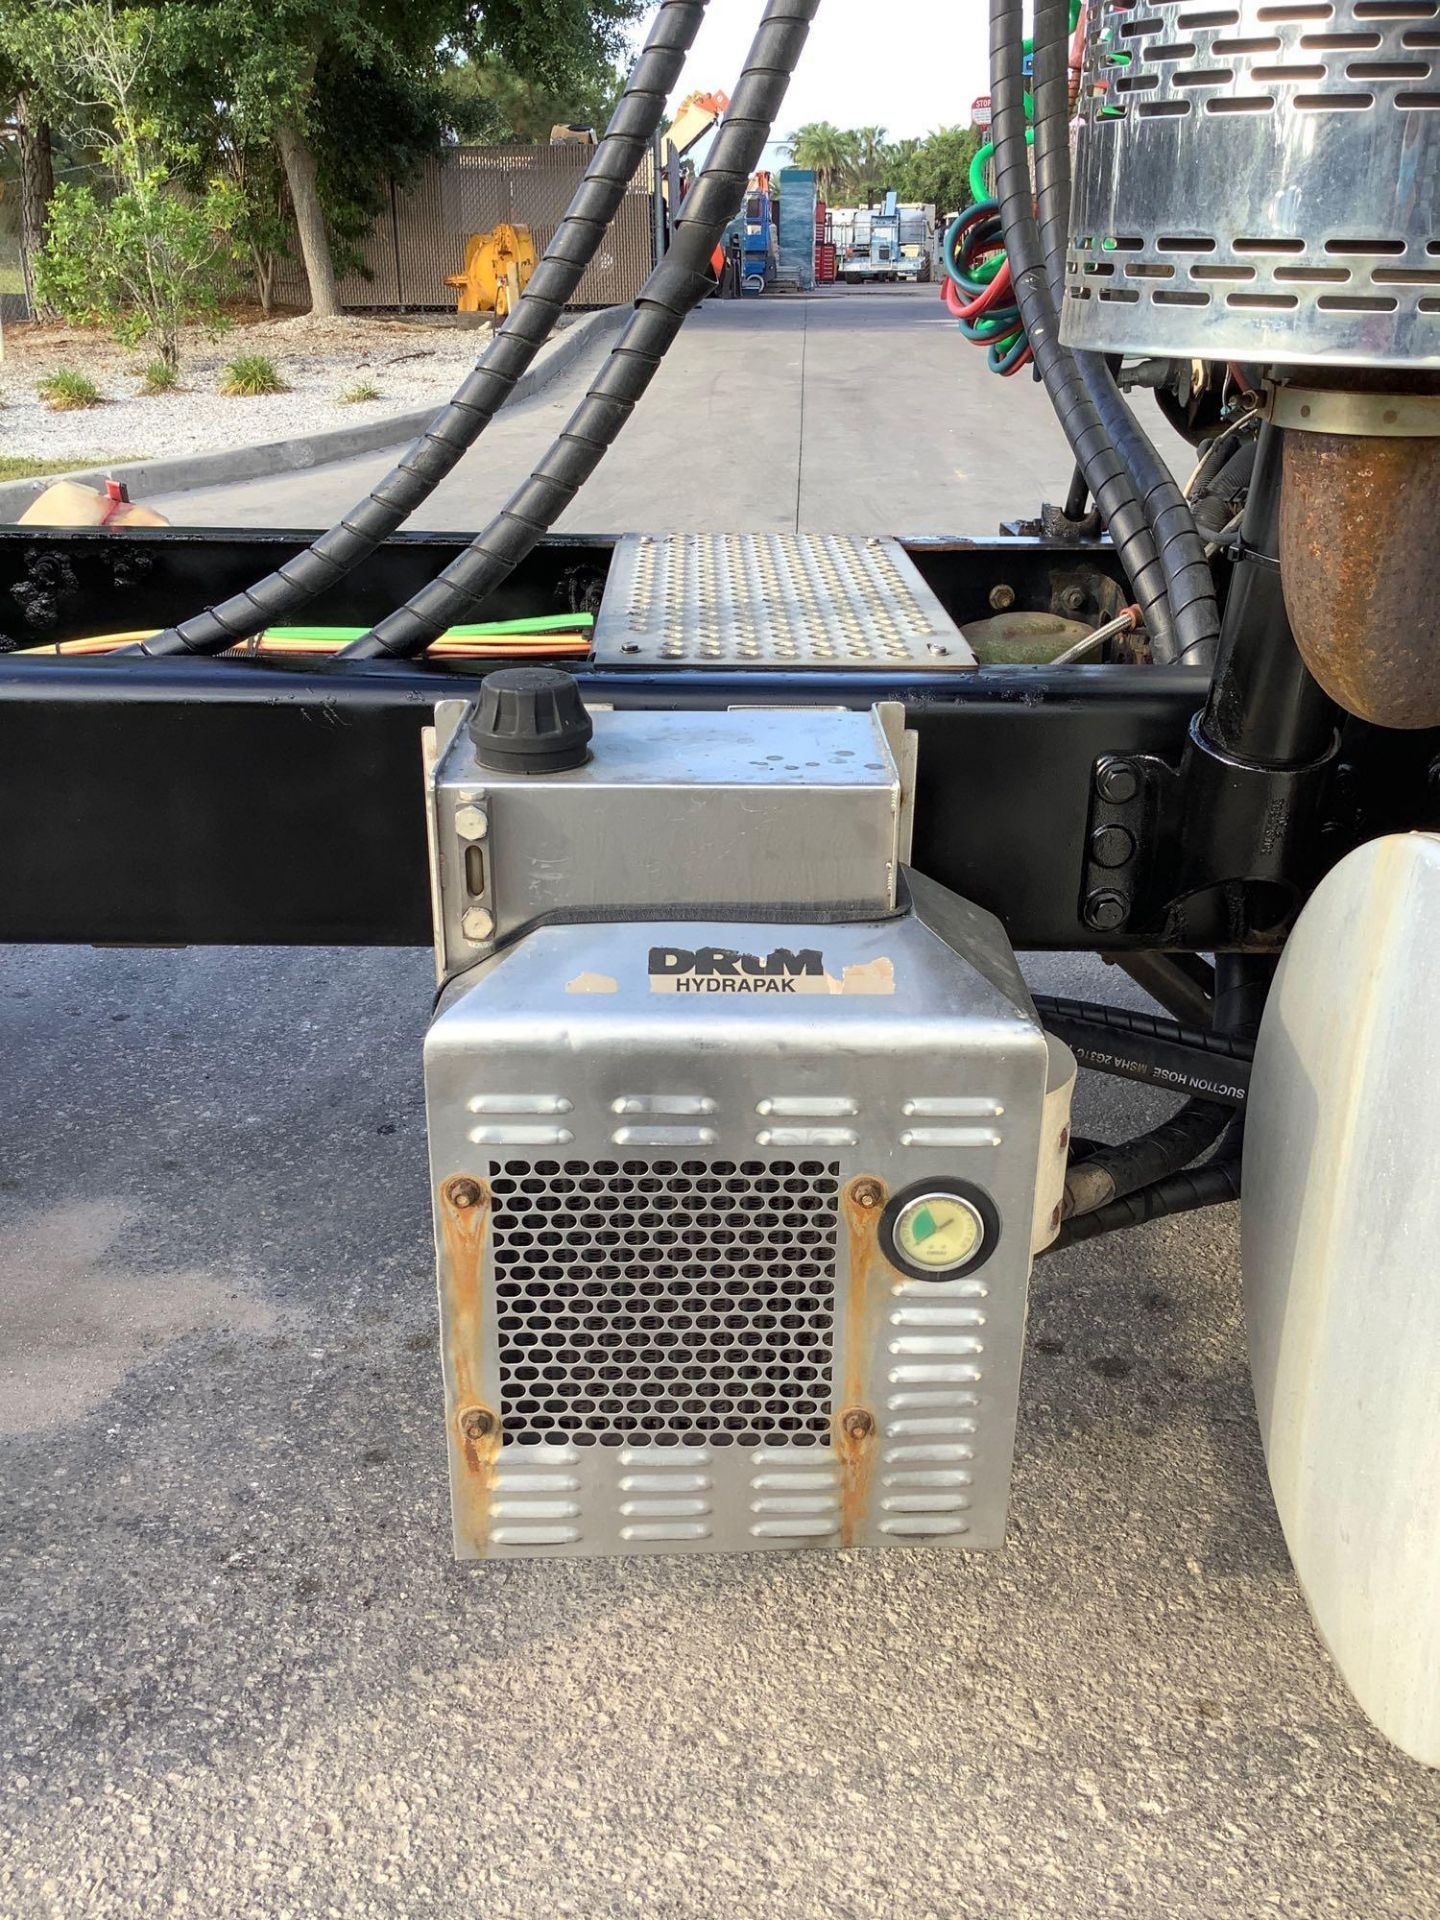 2013 INTERNATIONAL 8600,TRANSTAR ADVANCED DIESEL POWER, WET PACK HYDRAULICS , PANASONIC CD RADIO - Image 14 of 24